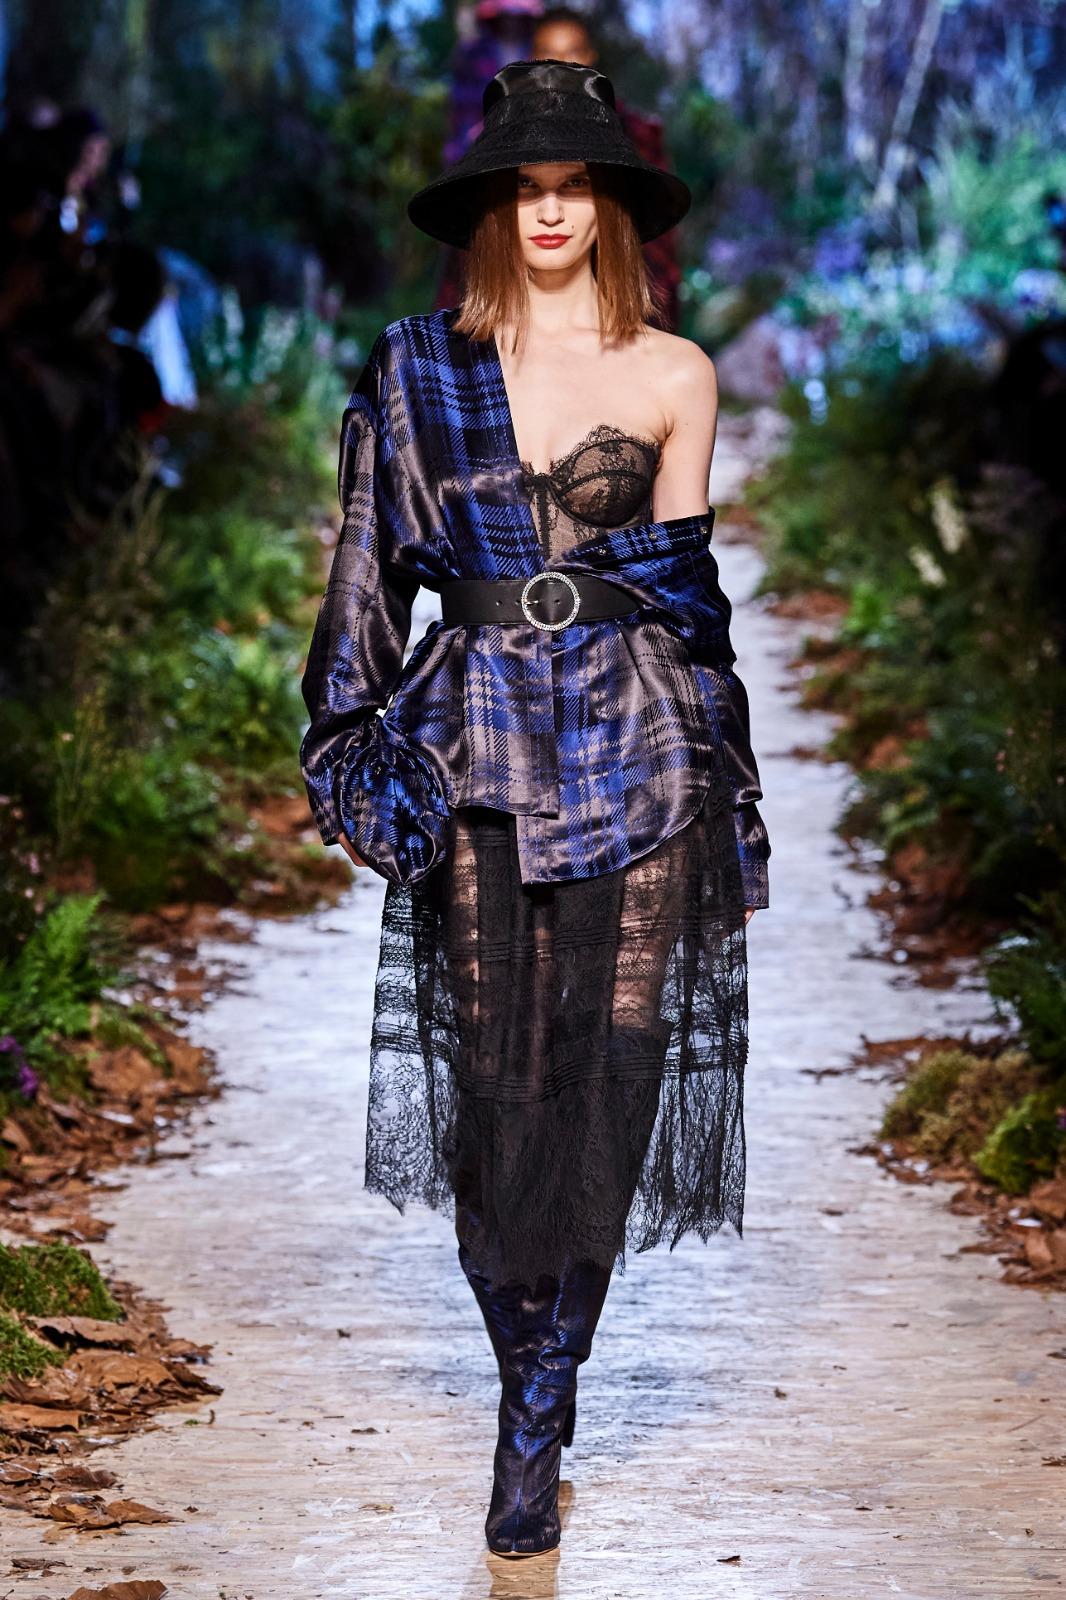 #ModicReview: Paris Fashion Week AW2020 Highlights - Vol. I